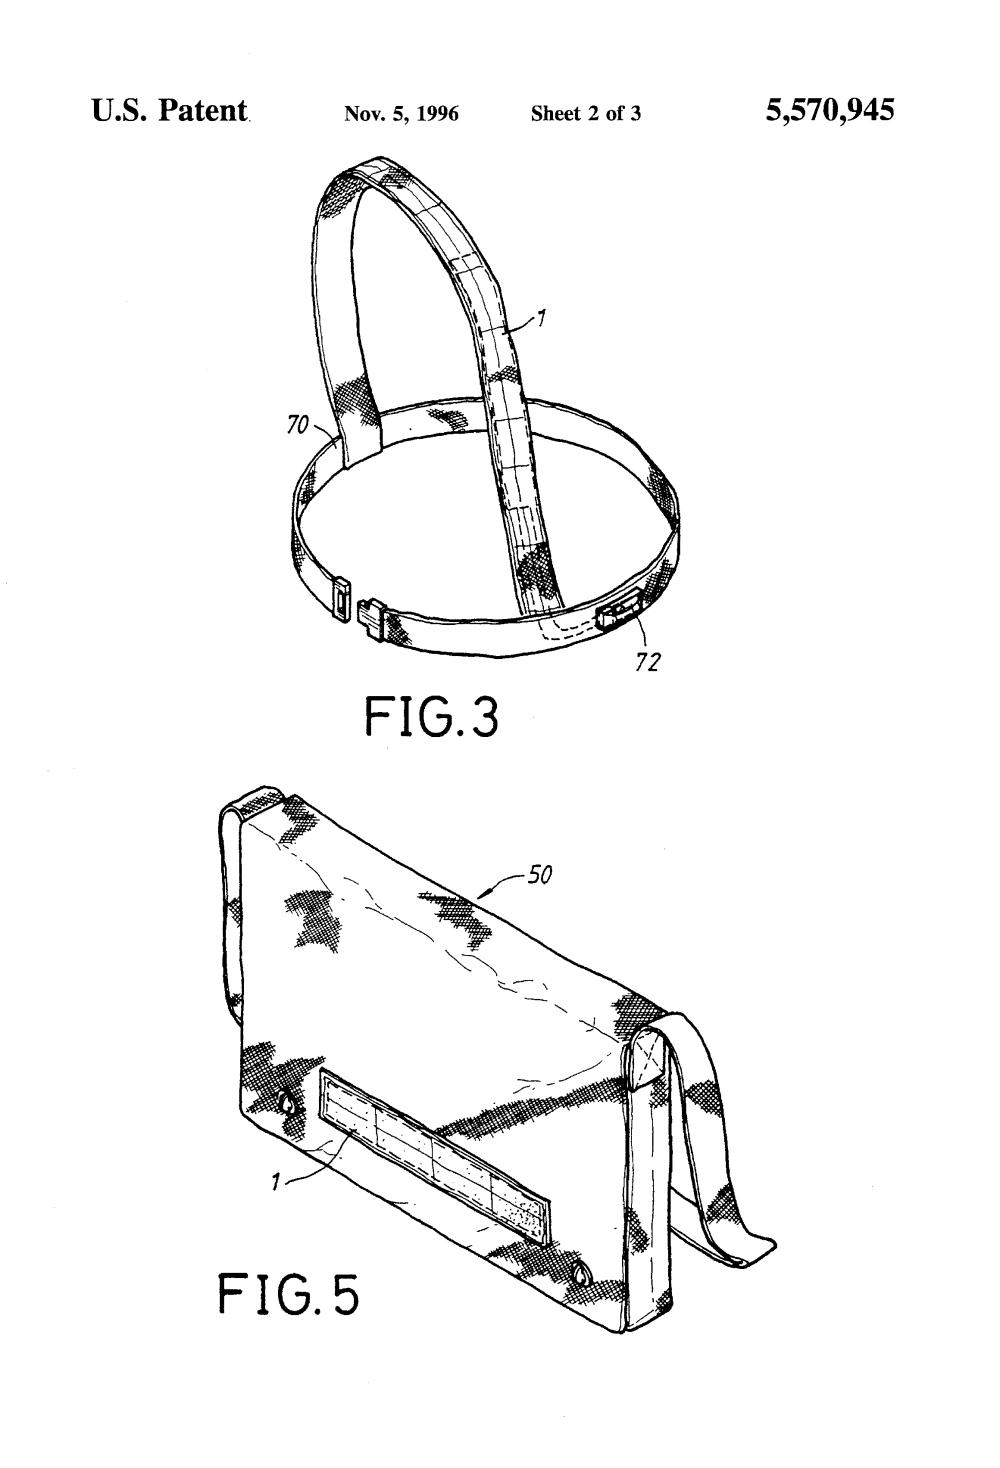 medium resolution of strip lighting google patents on wiring led light strips in parallel patent us5570945 soft light strip